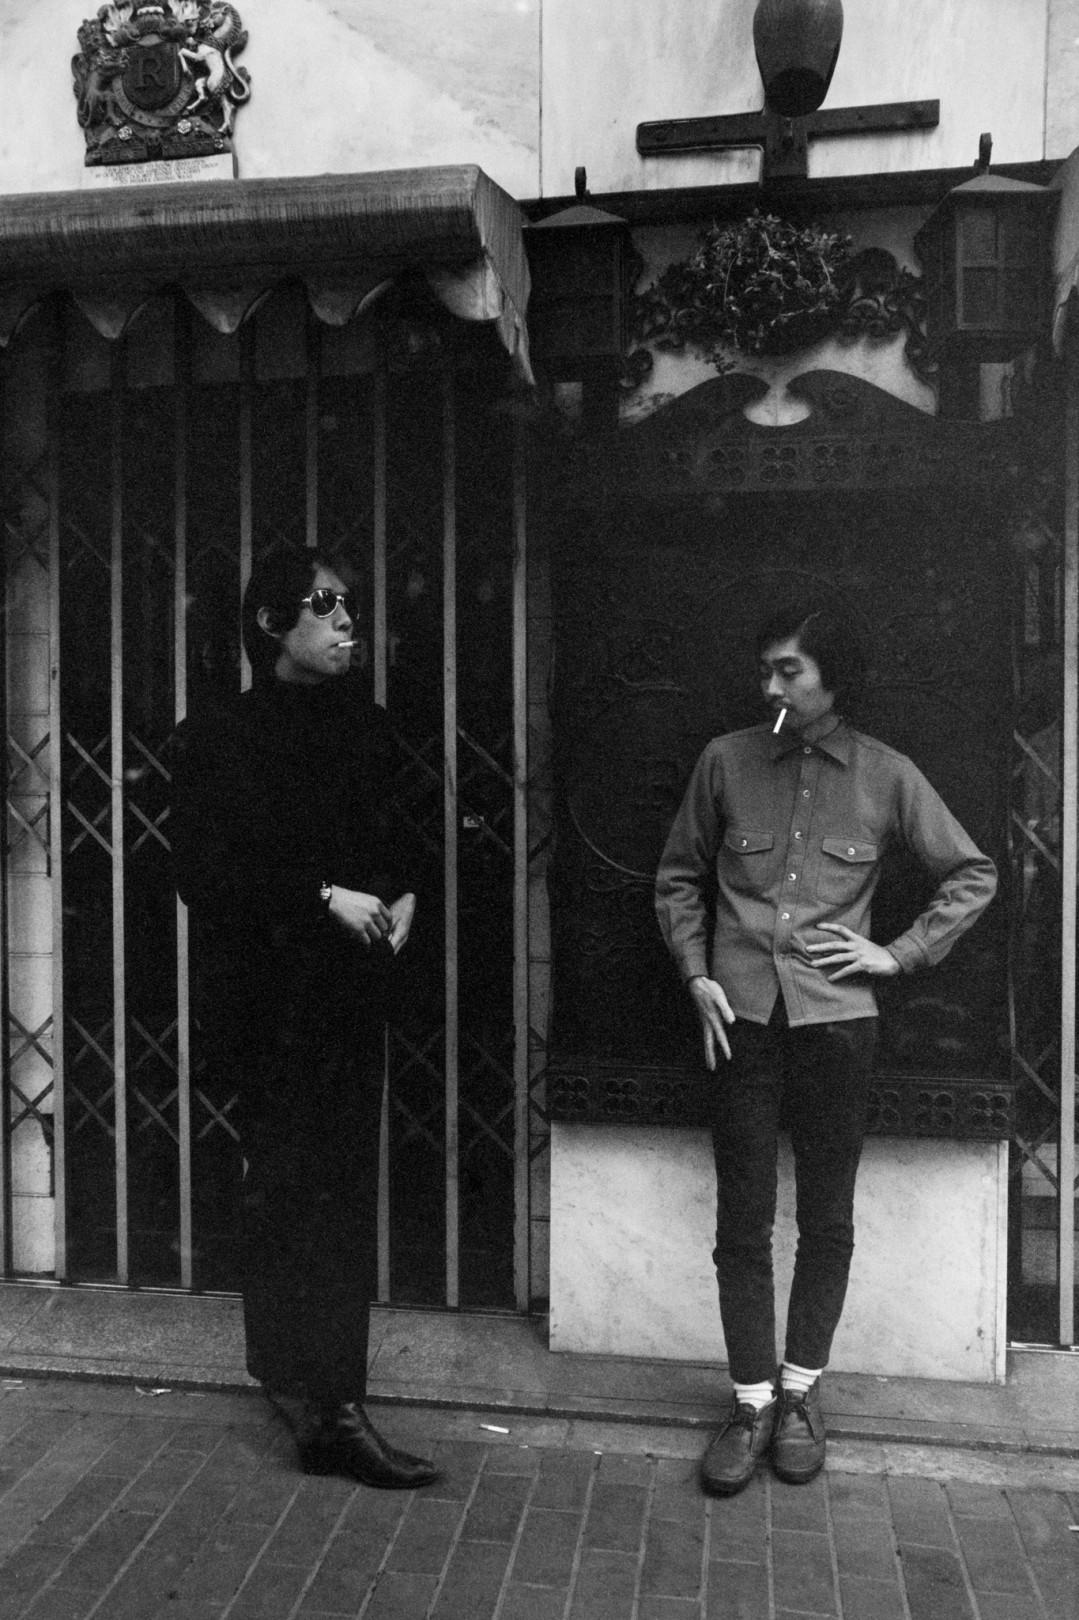 BIOTOP 2店舗で写真家・野上眞宏の写真展「BLUE: Tokyo 1968-1972」が開催